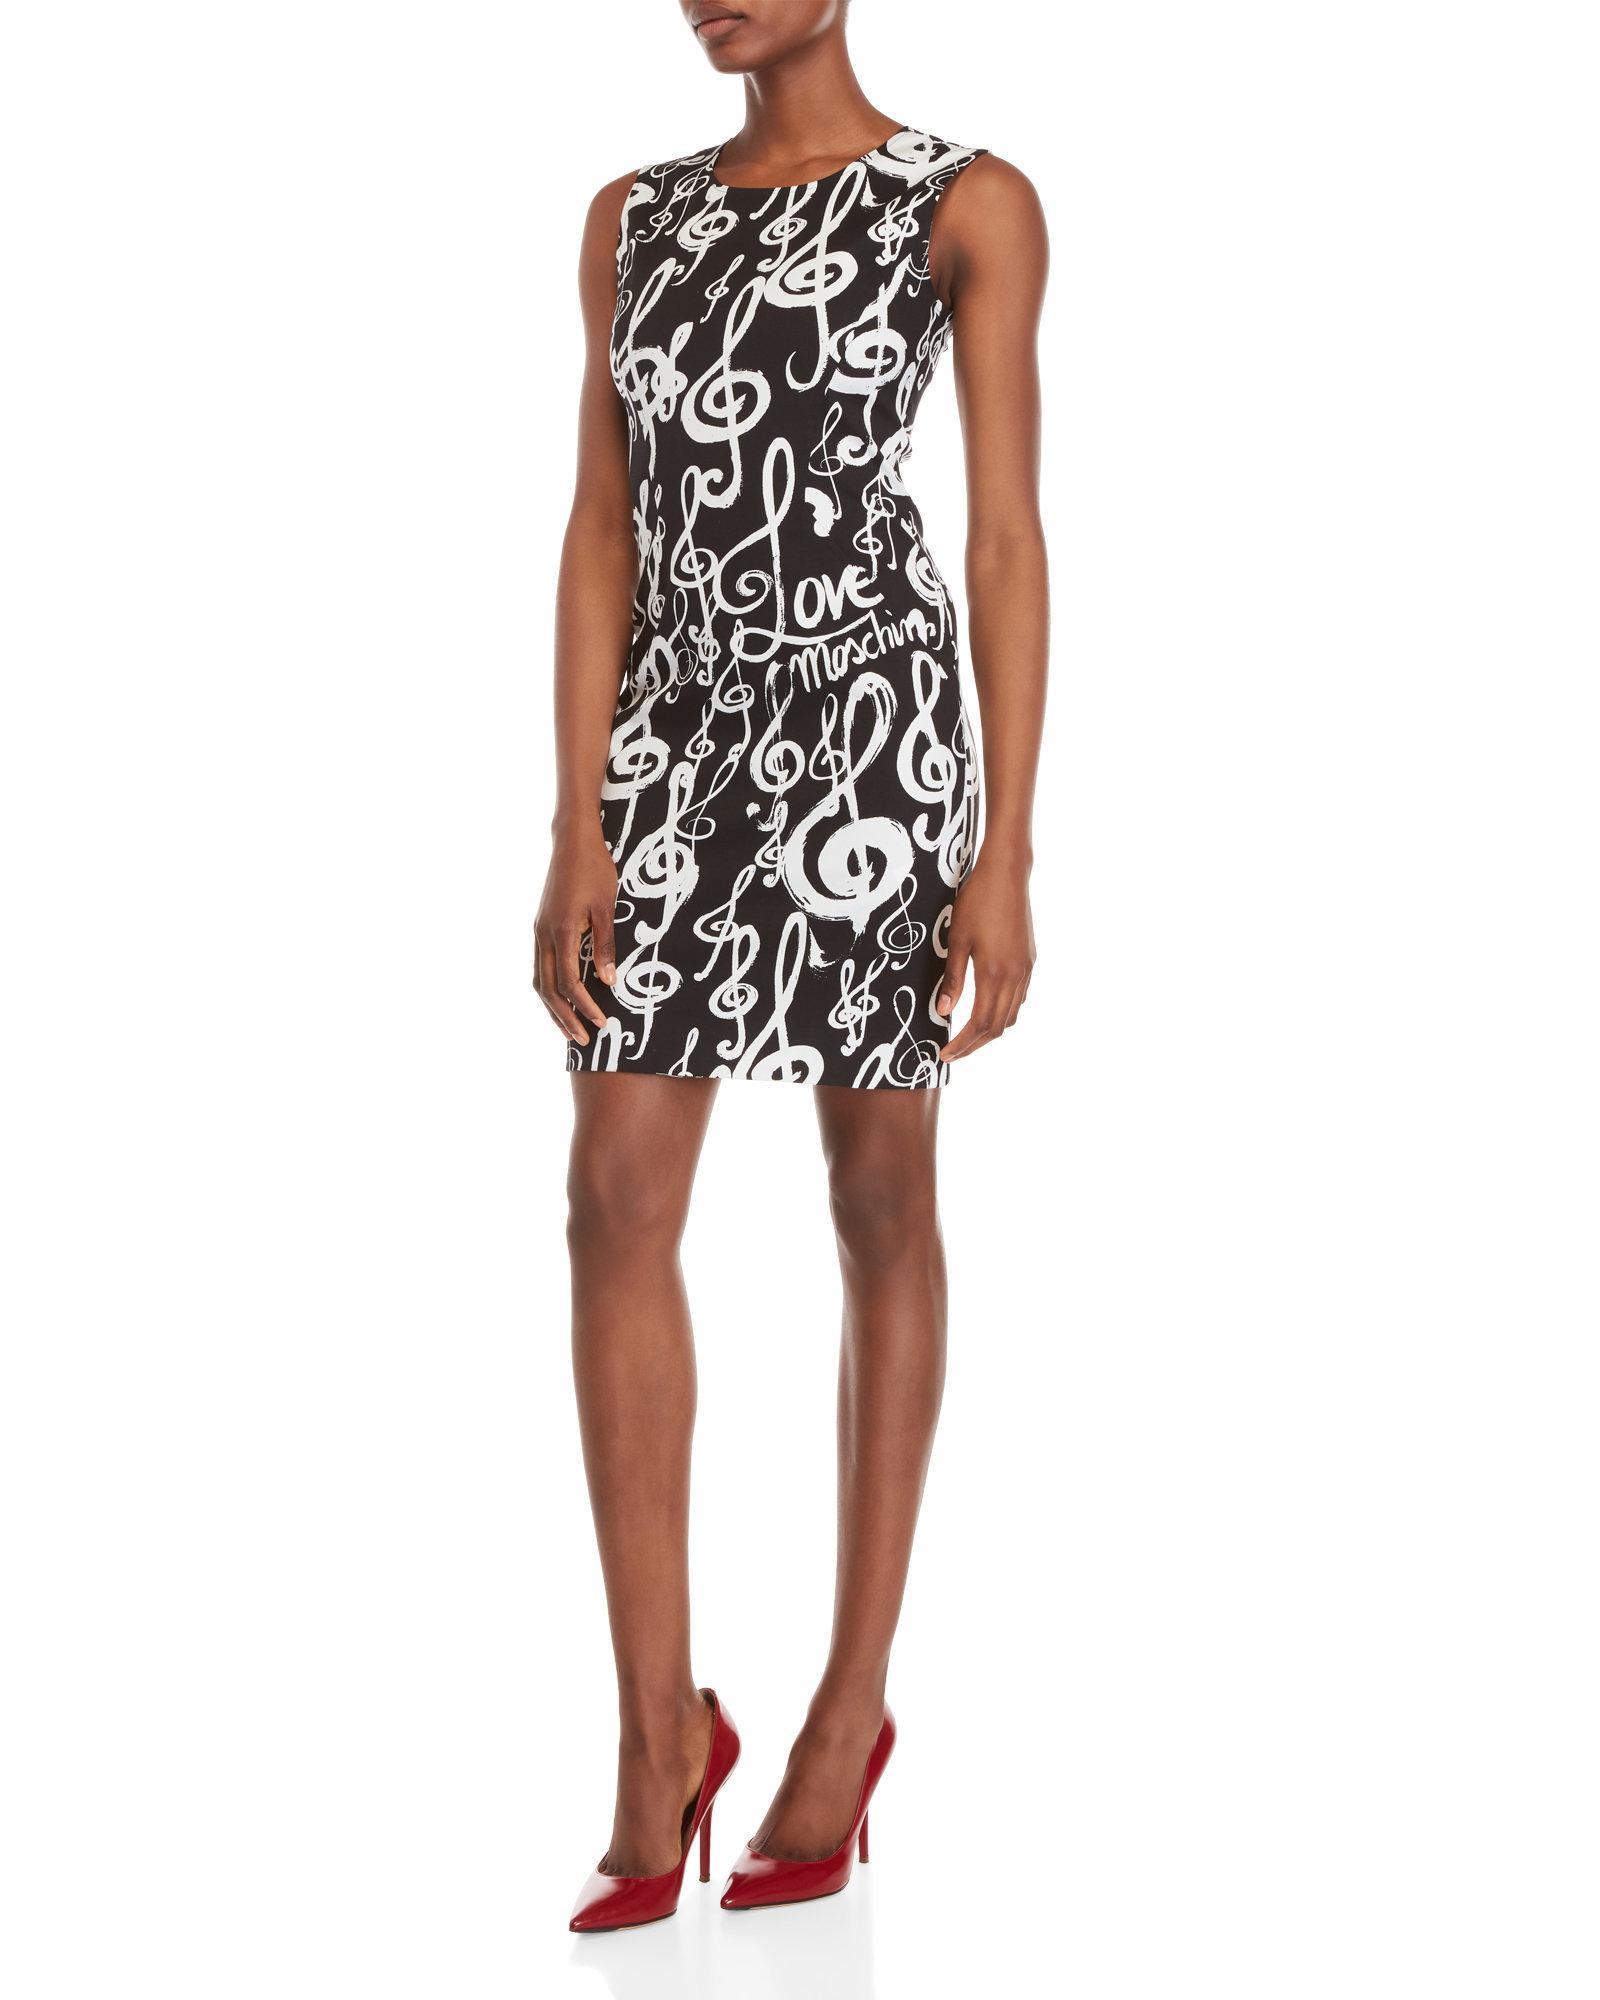 Lyst - Love Moschino Music Print Mini Sheath Dress in Black de97c9be382